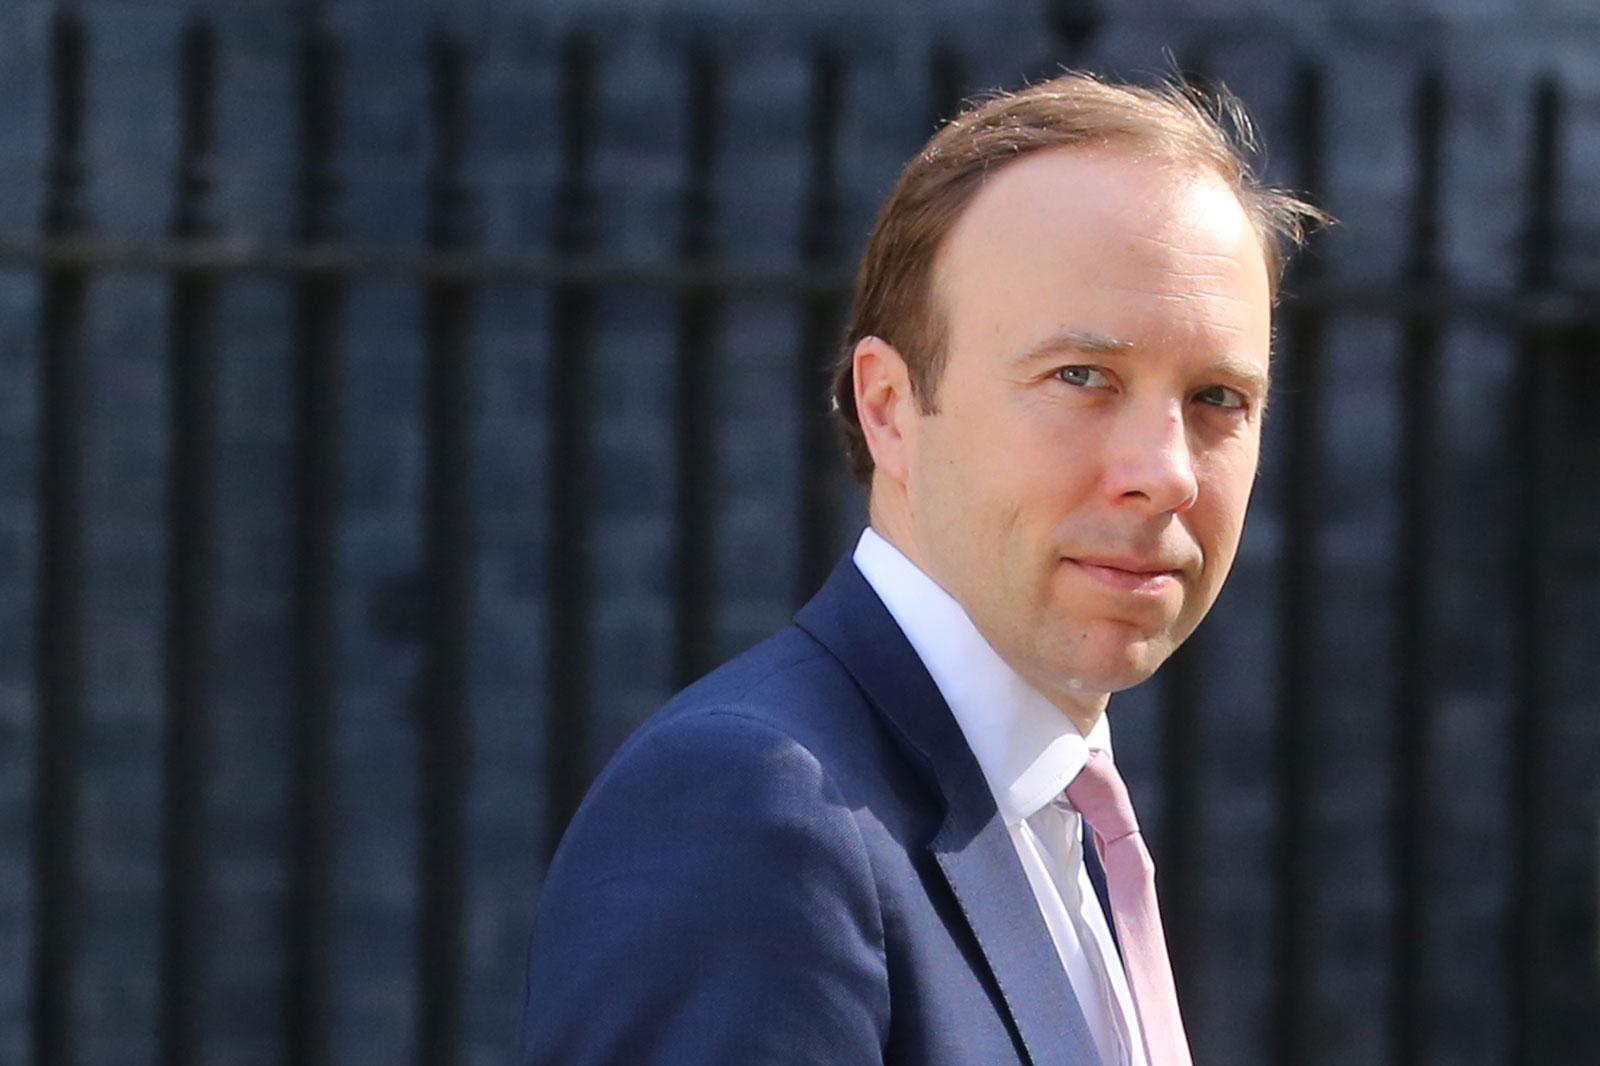 Britain's Health Secretary Matt Hancock leaves Downing street on May 27 in London.